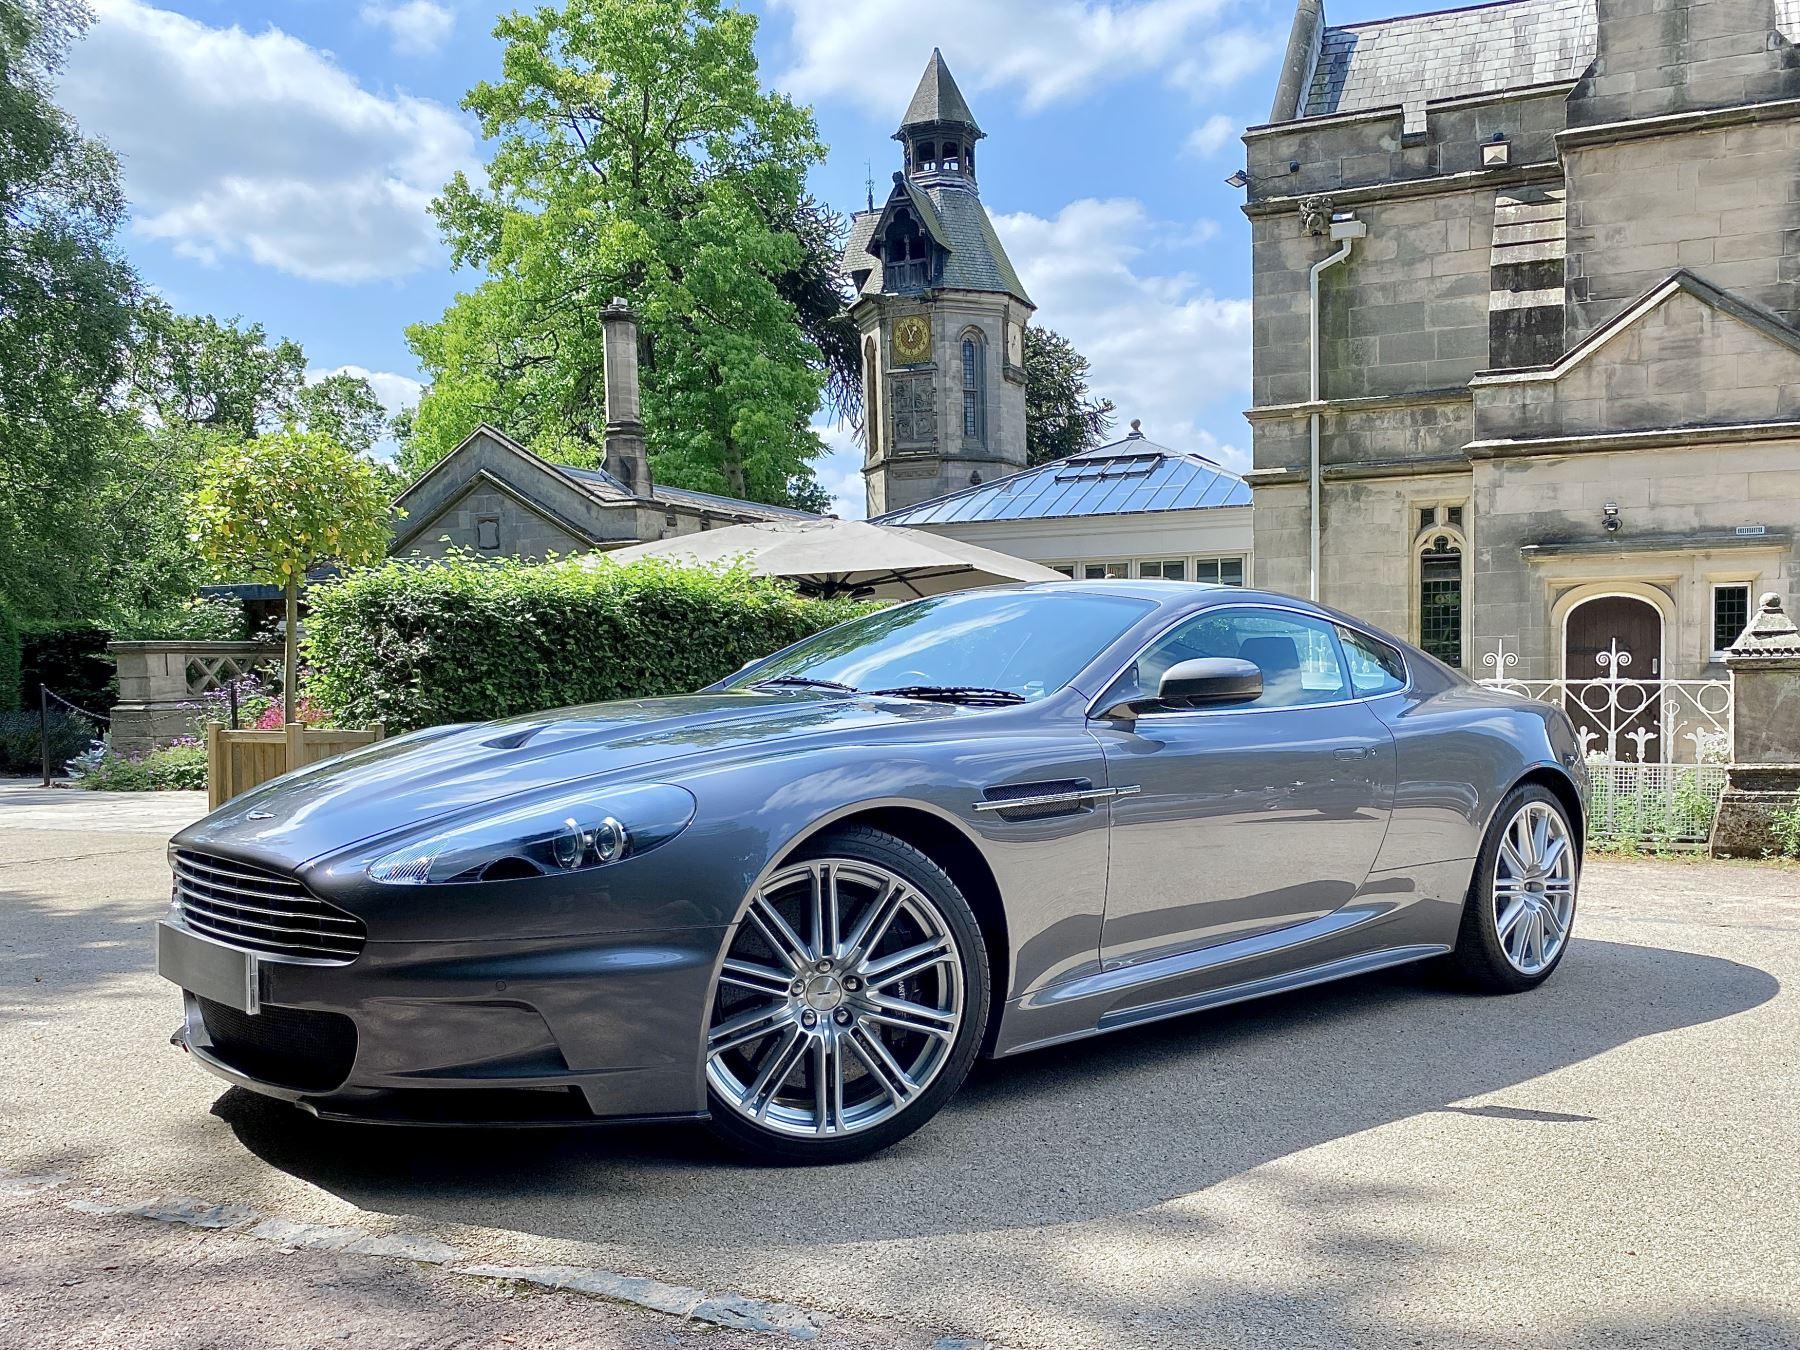 Aston Martin DBS V12 2dr image 3